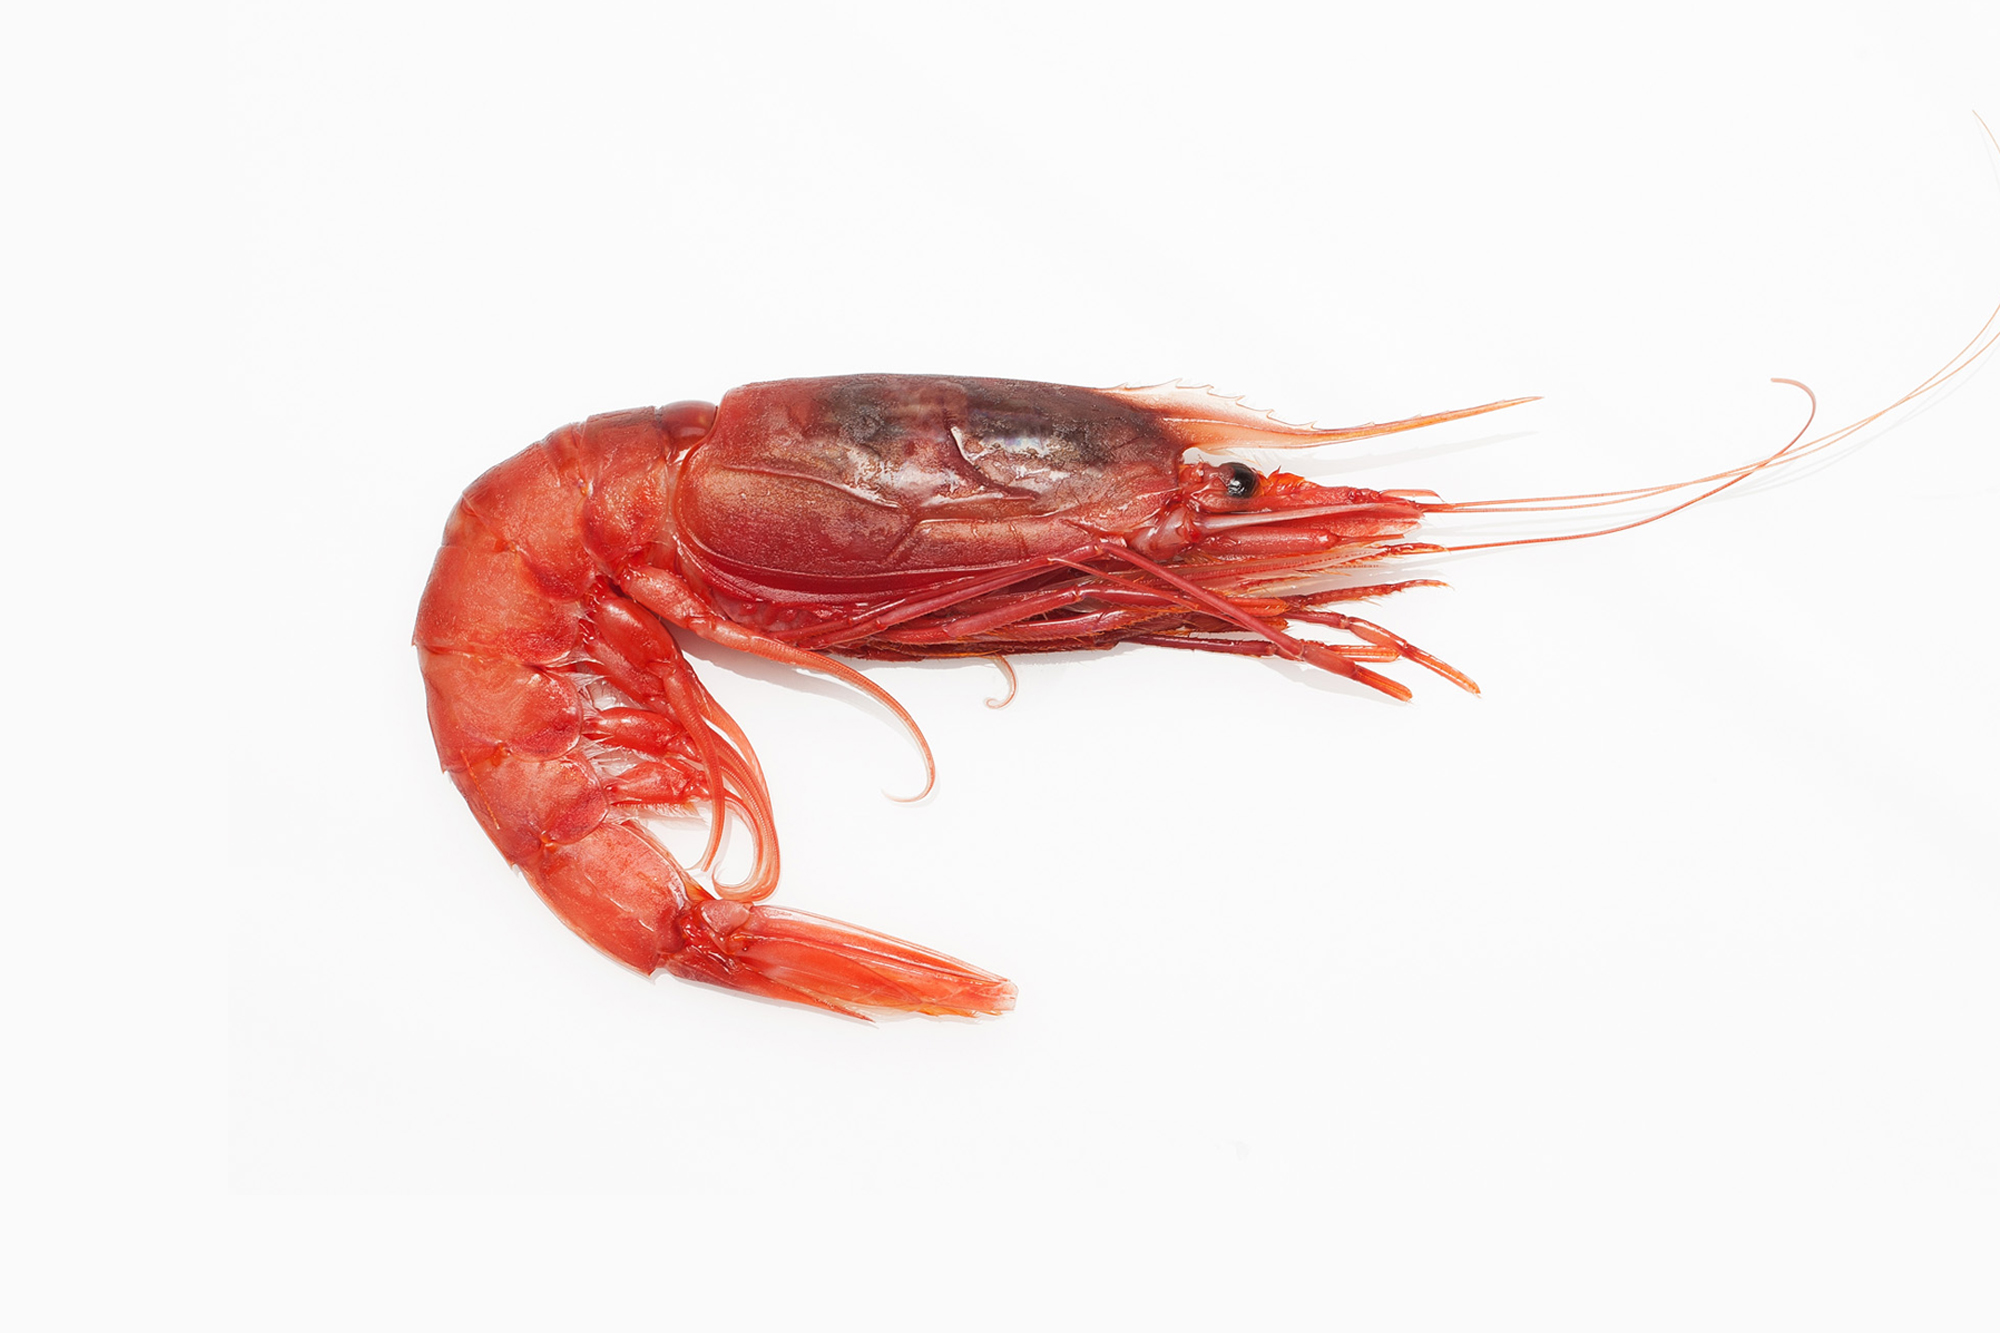 Crevette rouge Image